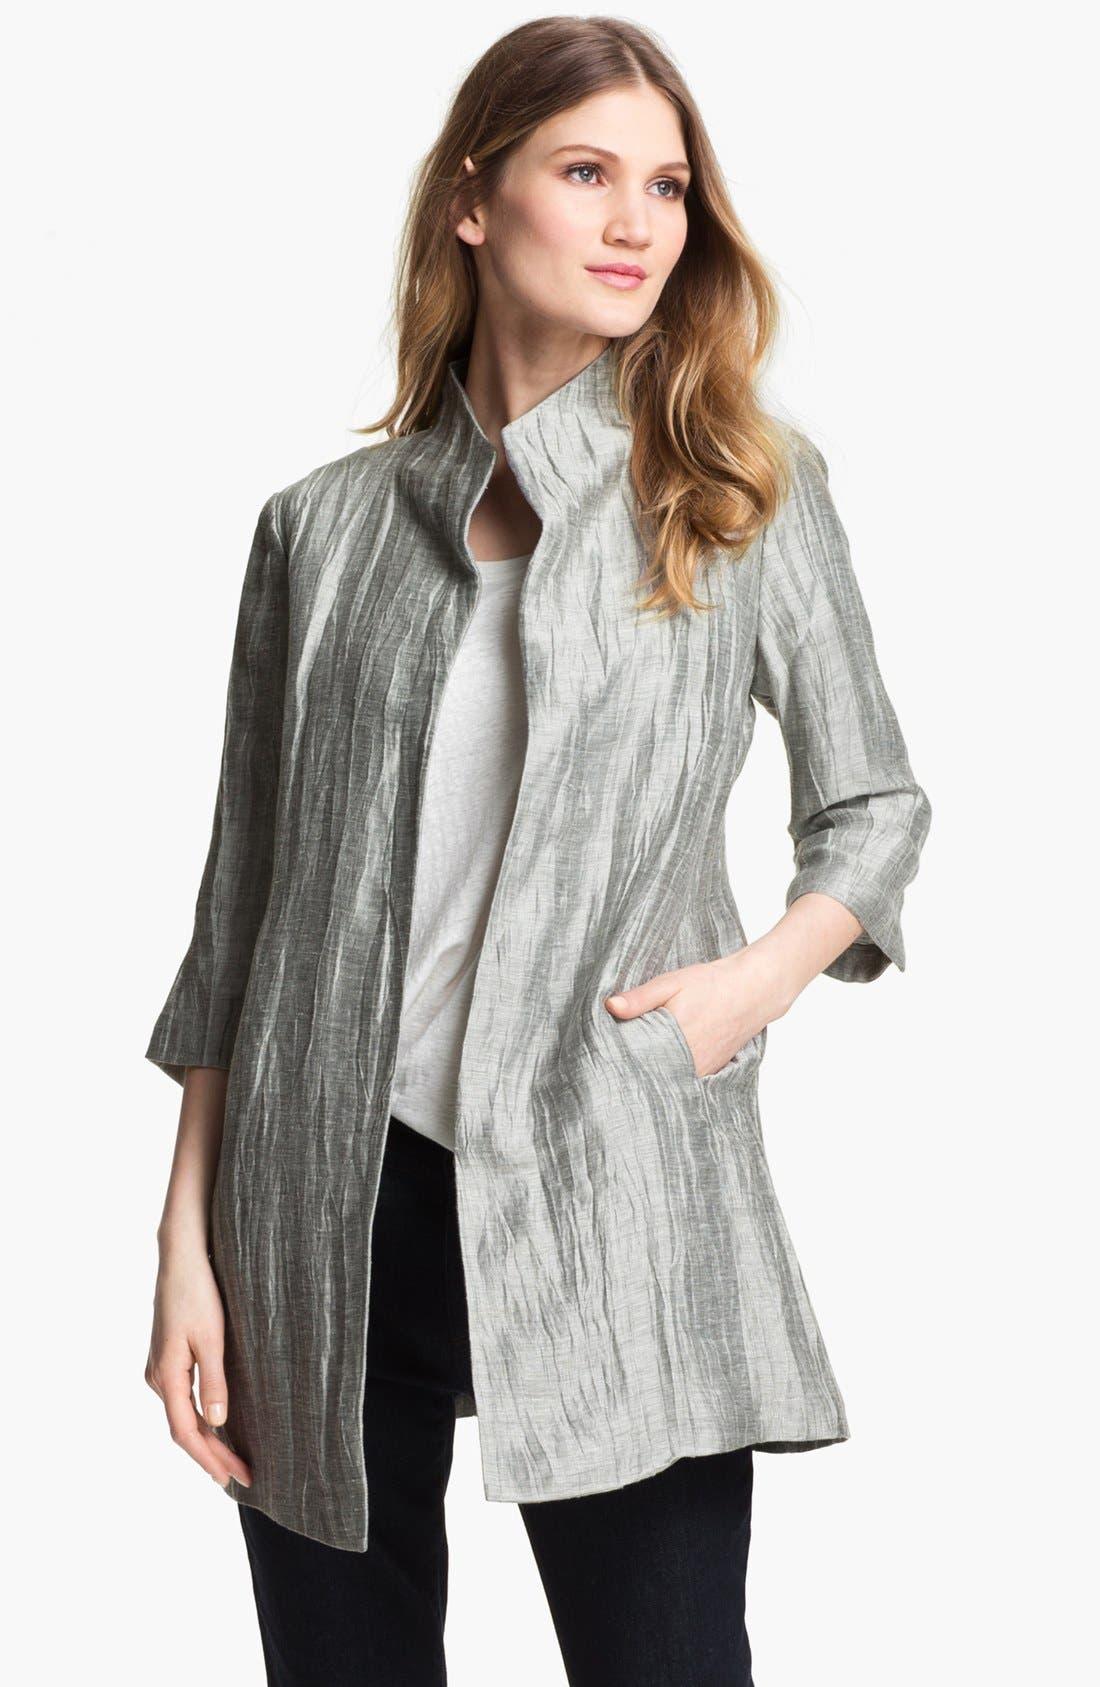 Alternate Image 1 Selected - Eileen Fisher Crinkled Linen Jacket (Petite)